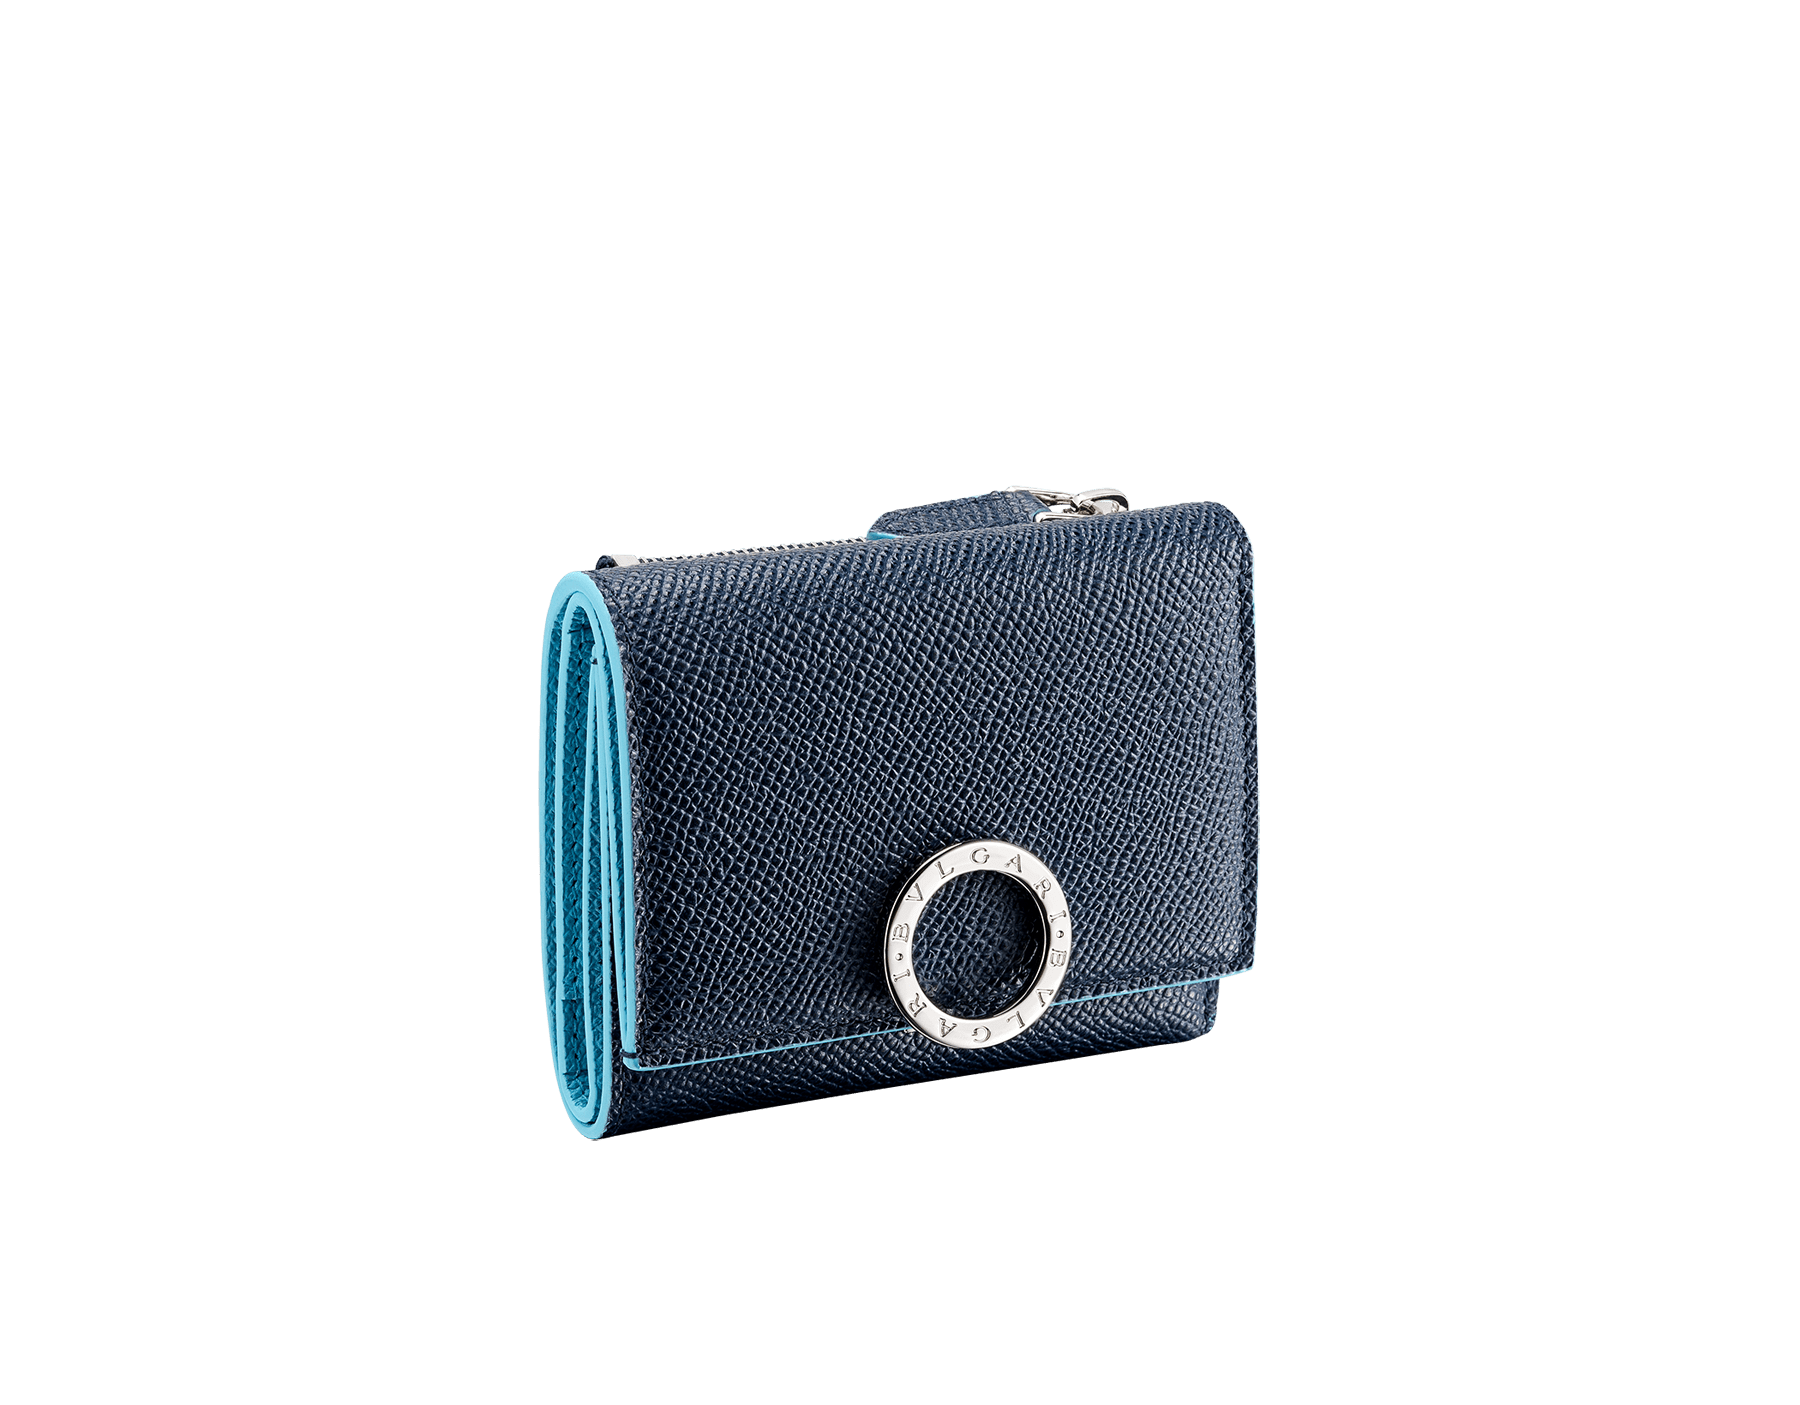 """Bvlgari Clip"" slim compact wallet in Denim Sapphire blue and Aegean Topaz light blue grained calfskin. Iconiclogo clip closure in palladium-plated brass BCM-SLIMCOMPACTa image 1"